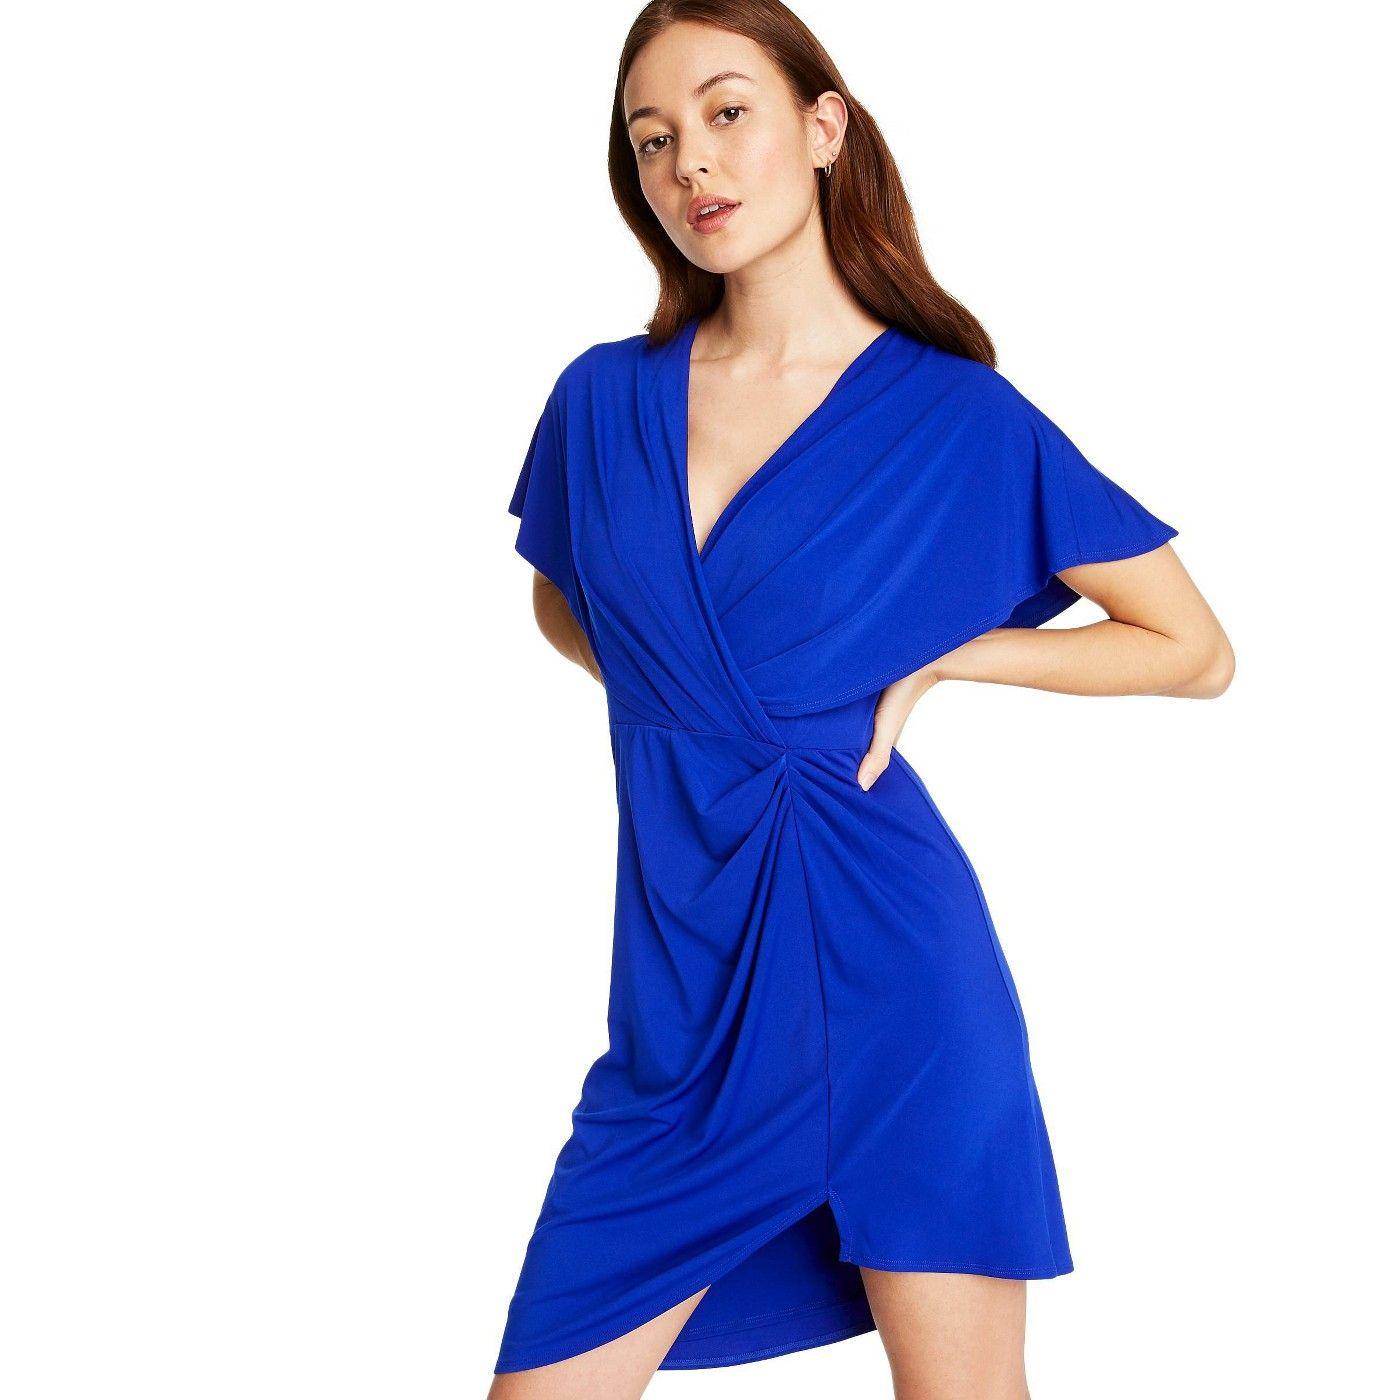 Women S High Low Dress Cushnie For Target Regular Plus Royal Blue Sponsored Dress Sponsored Cushnie W Fashion High Low Dress Casual Style Outfits [ 1400 x 1400 Pixel ]